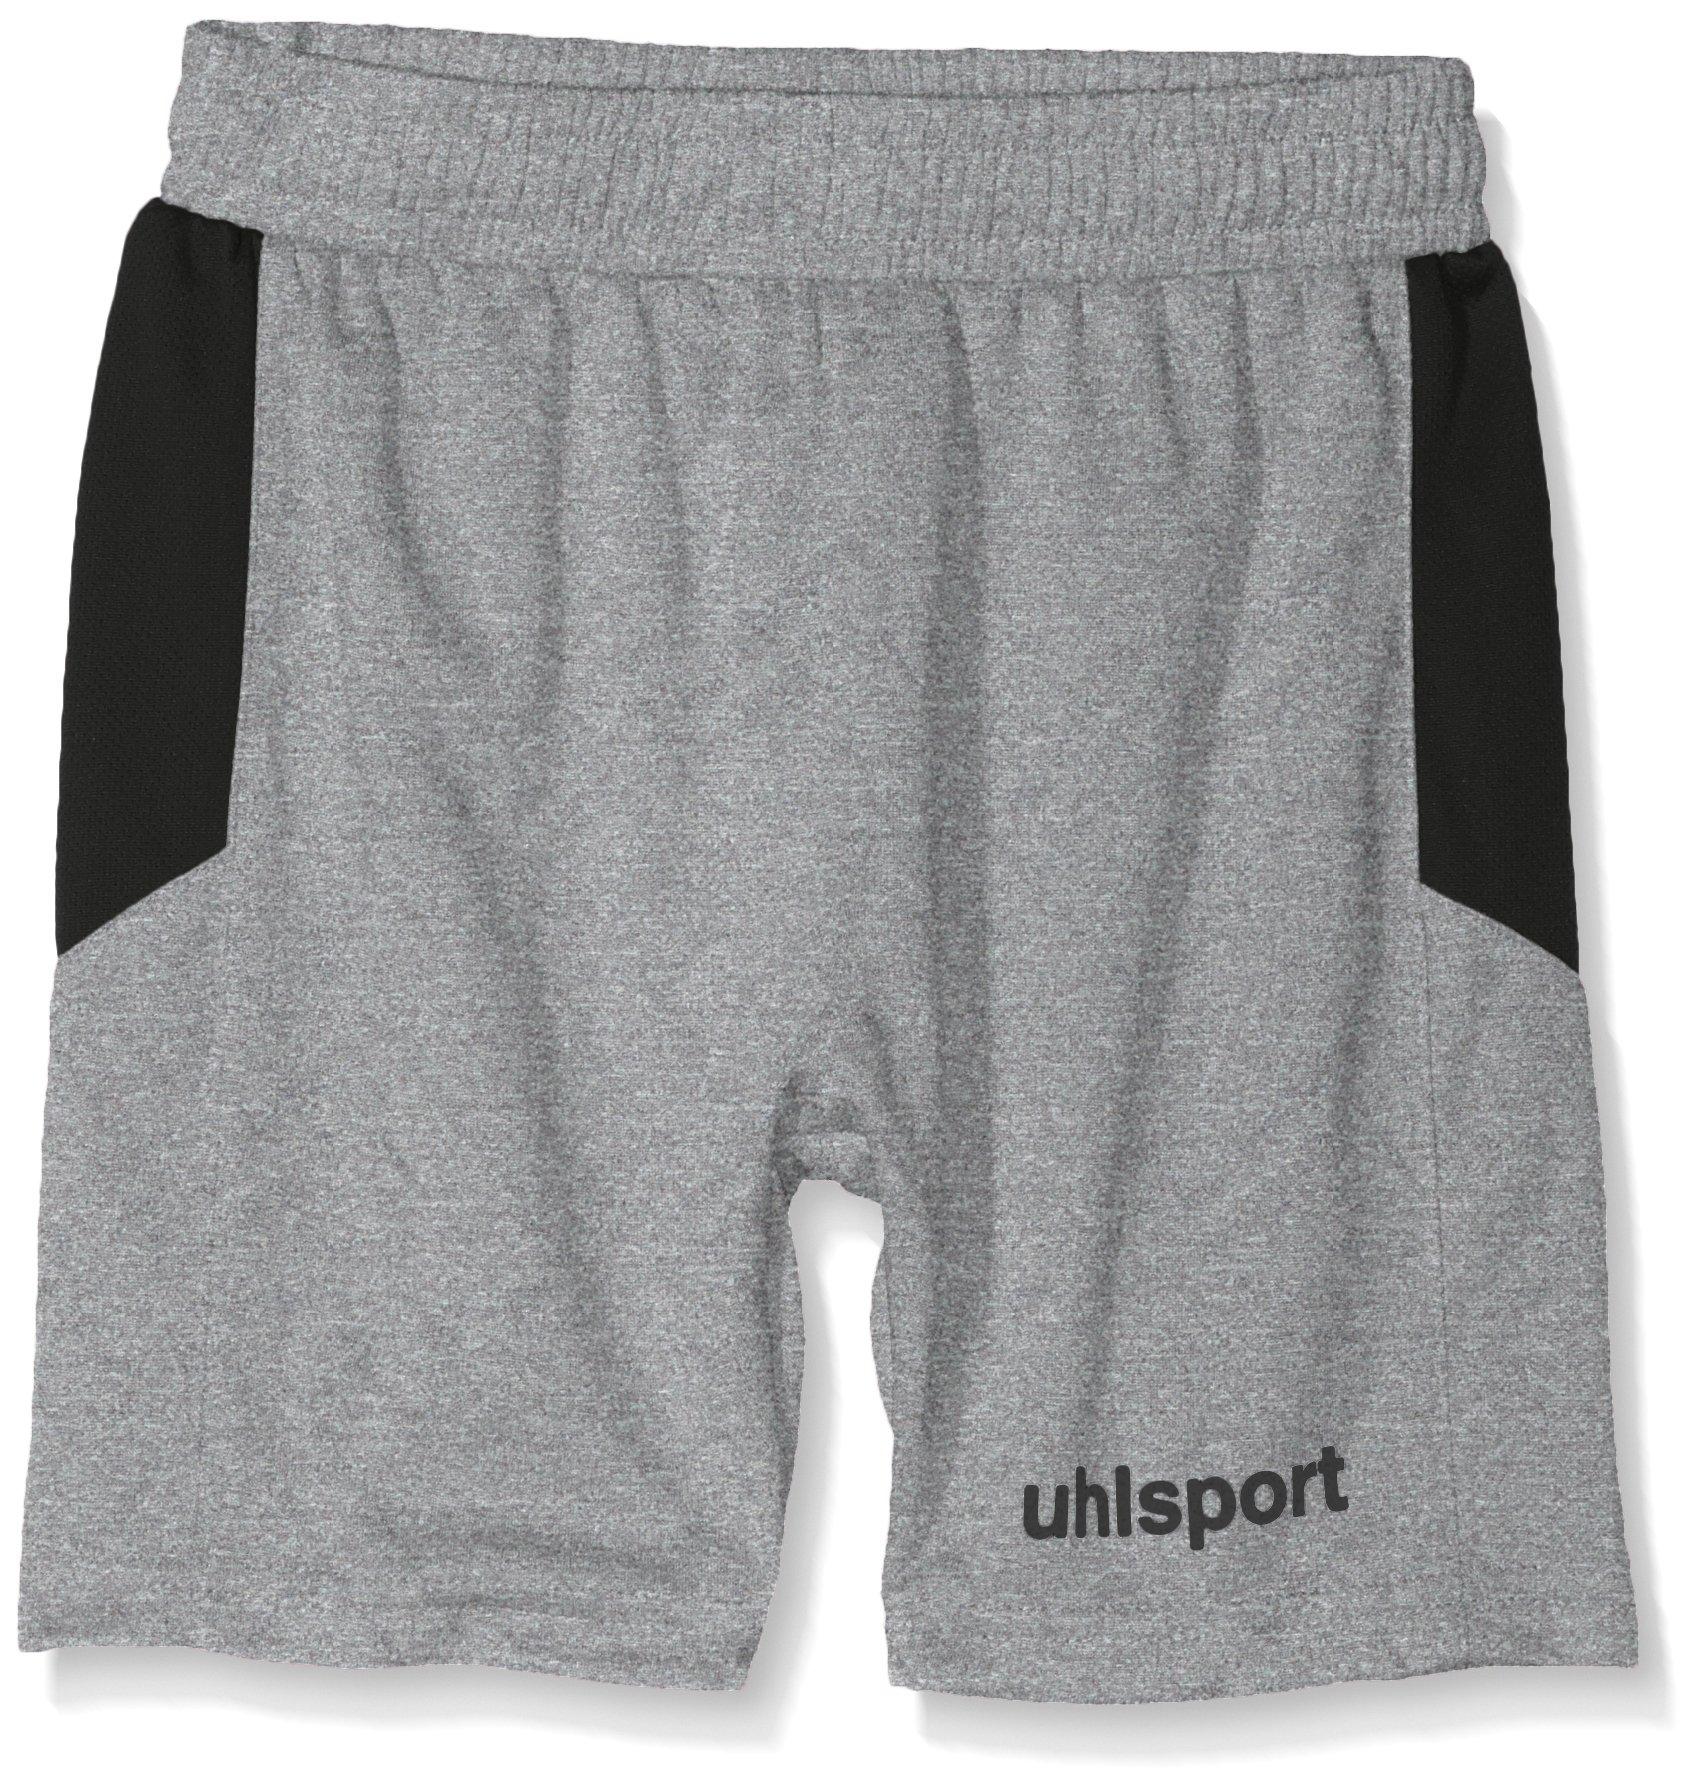 Uhlsport GOAL GK Shorts Size L grey/black by uhlsport